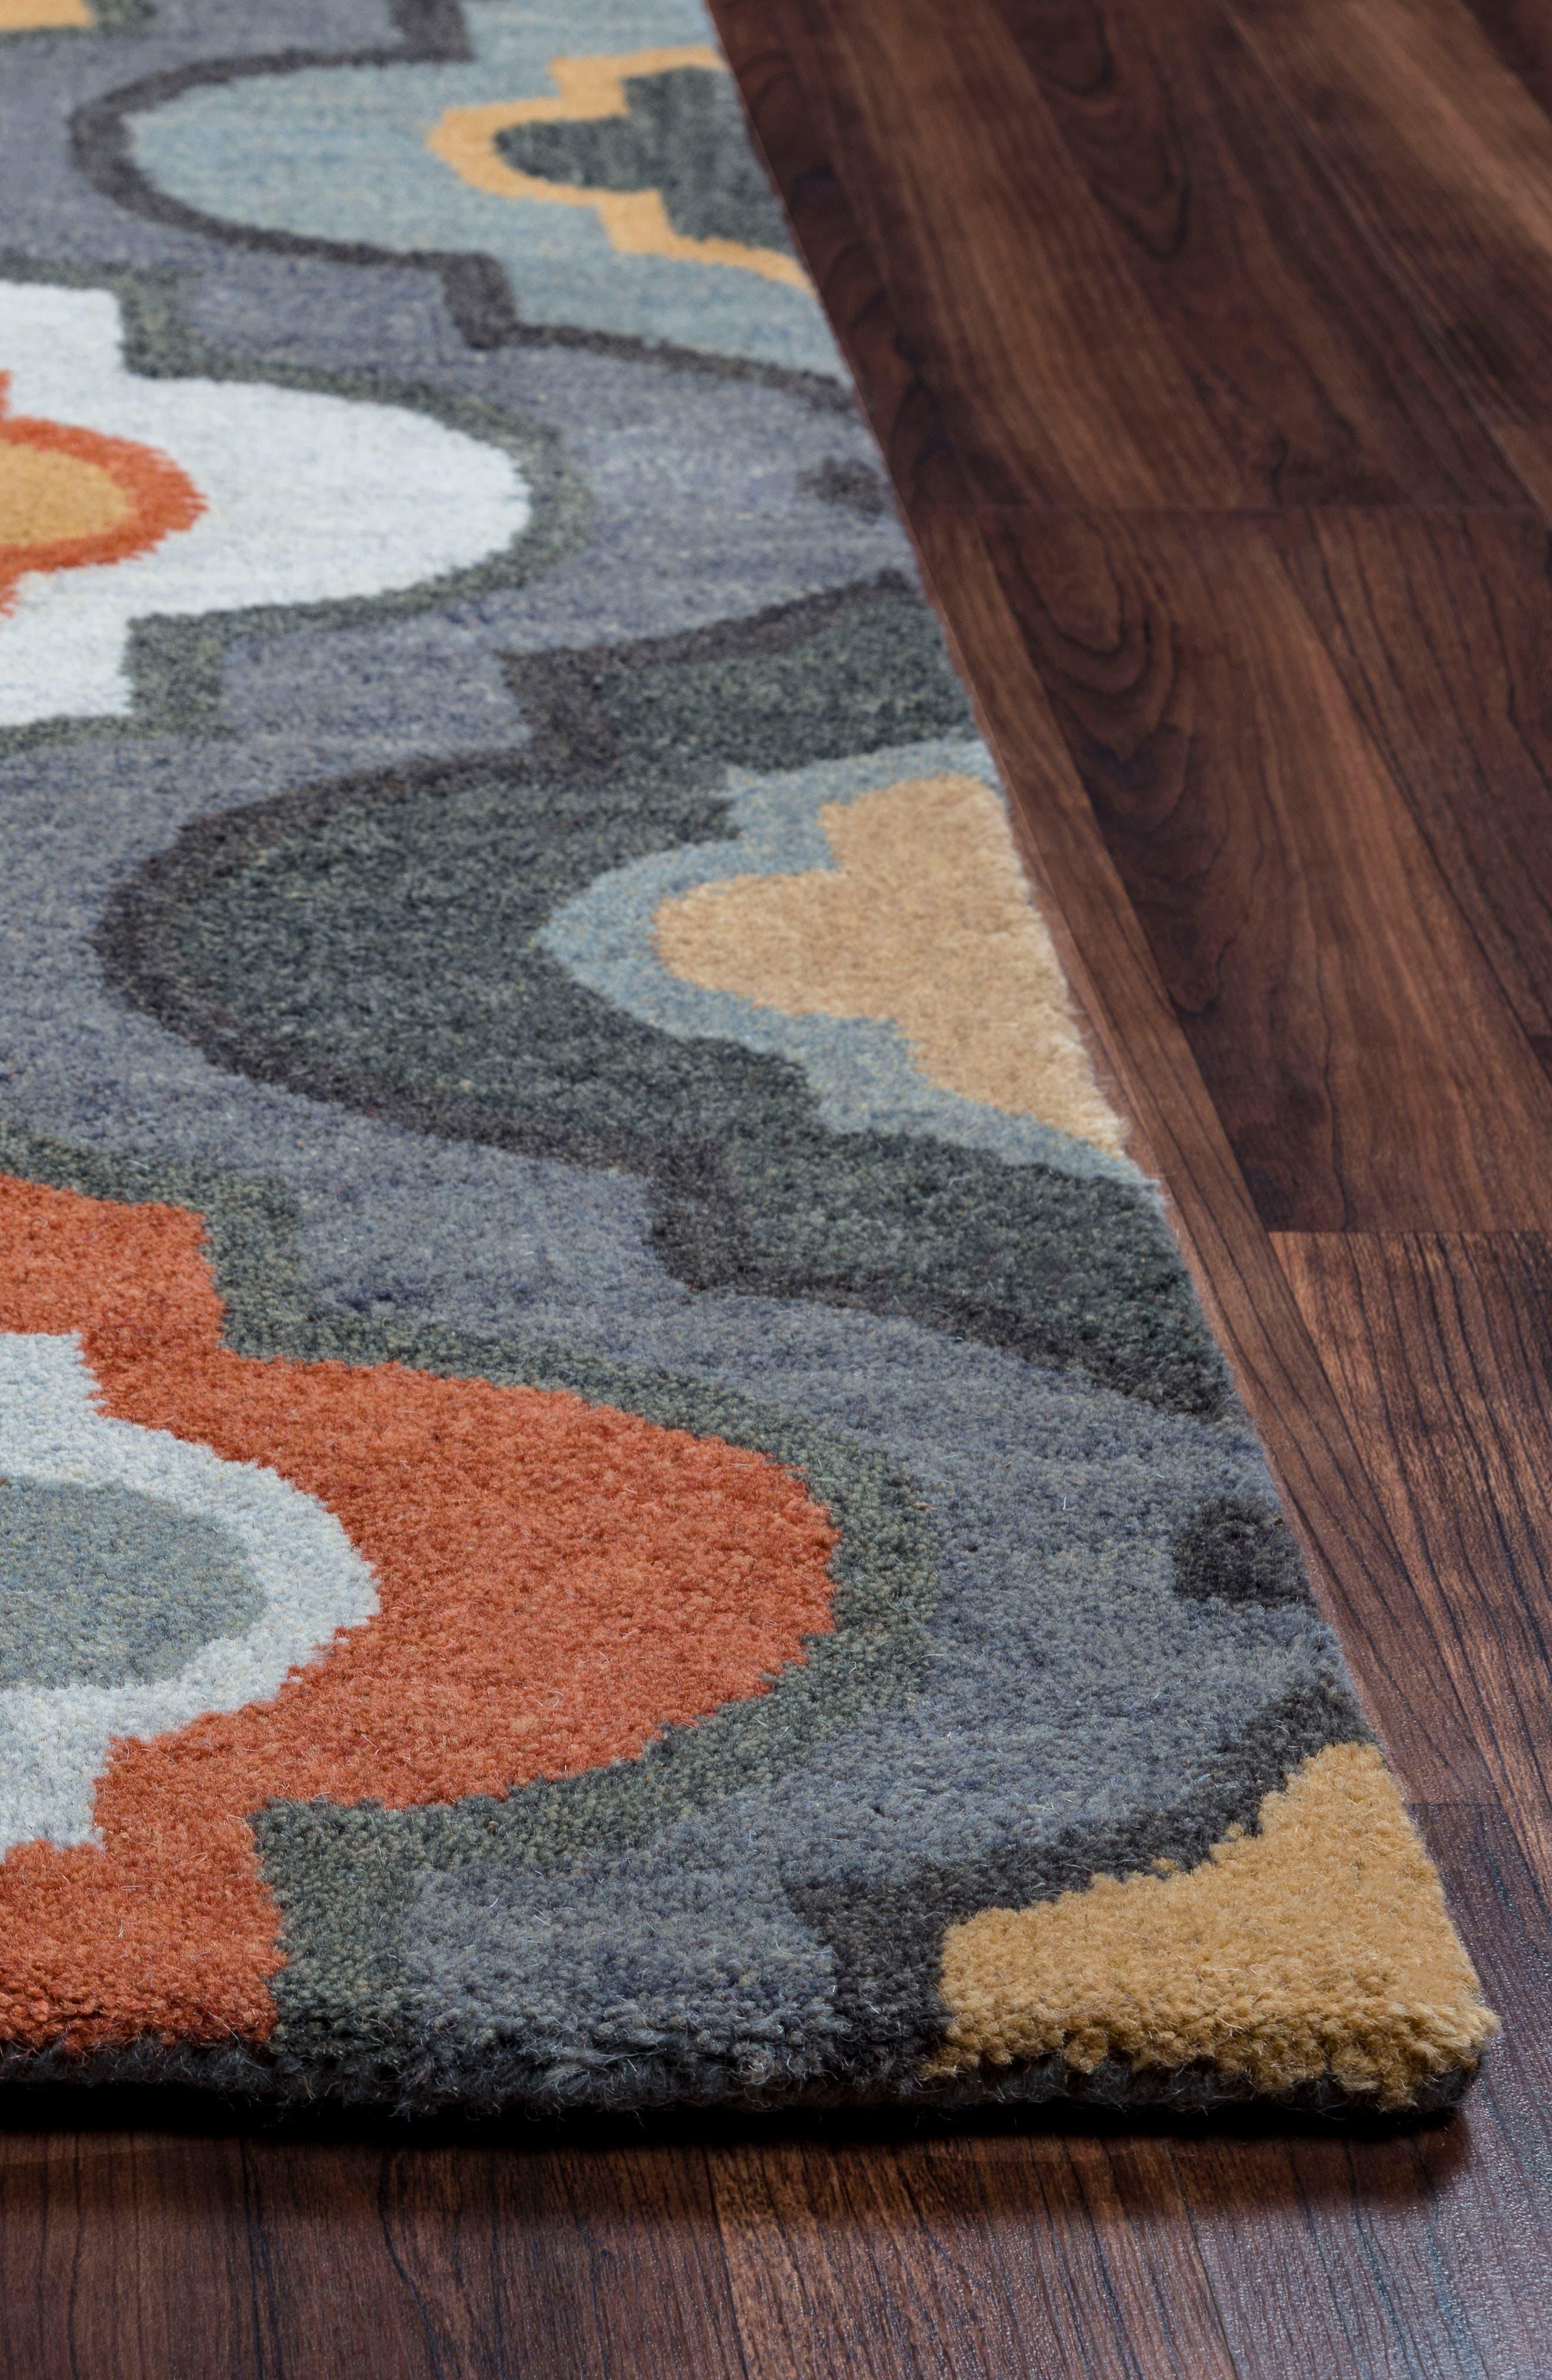 'Quatrefoil' Hand Tufted Wool Area Rug,                             Alternate thumbnail 5, color,                             030